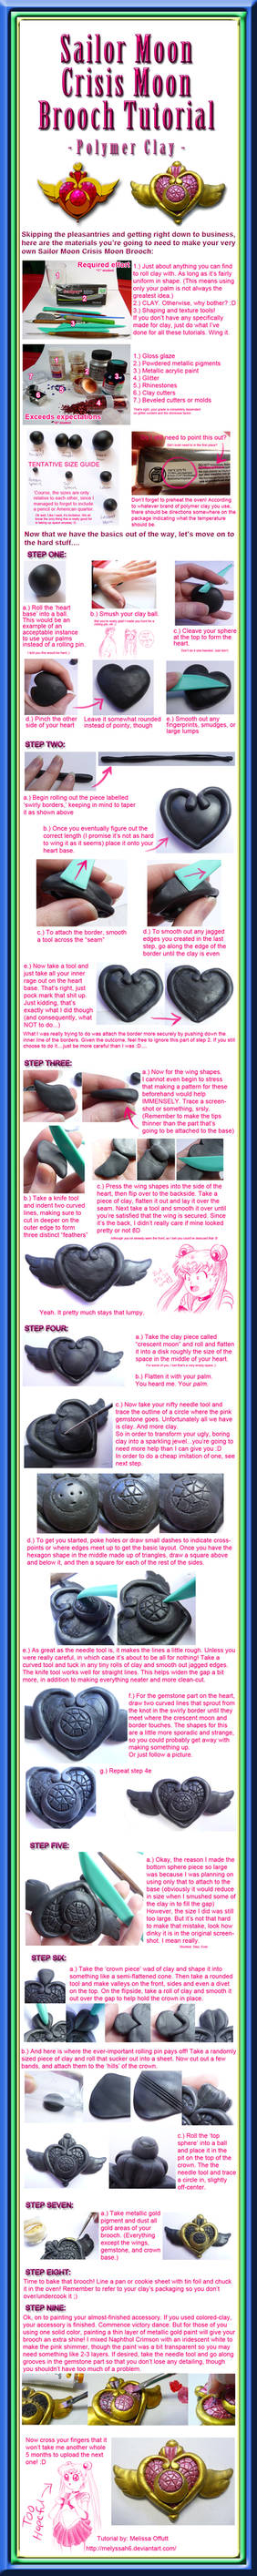 Sailor Moon Crisis Moon Brooch Tutorial